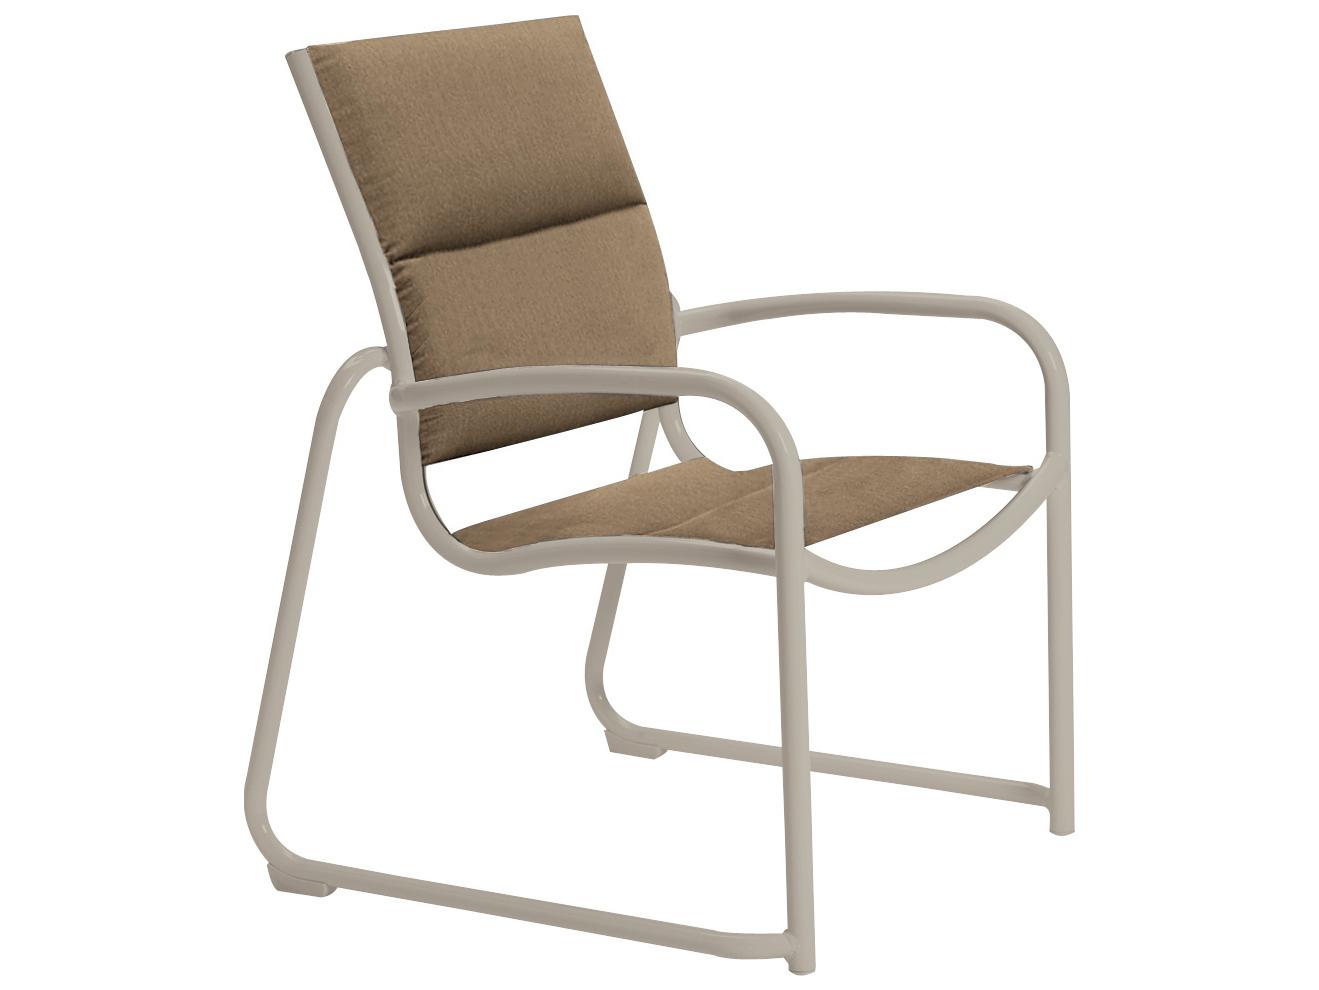 milennia padded sling aluminum dining chair sled base 220425ps